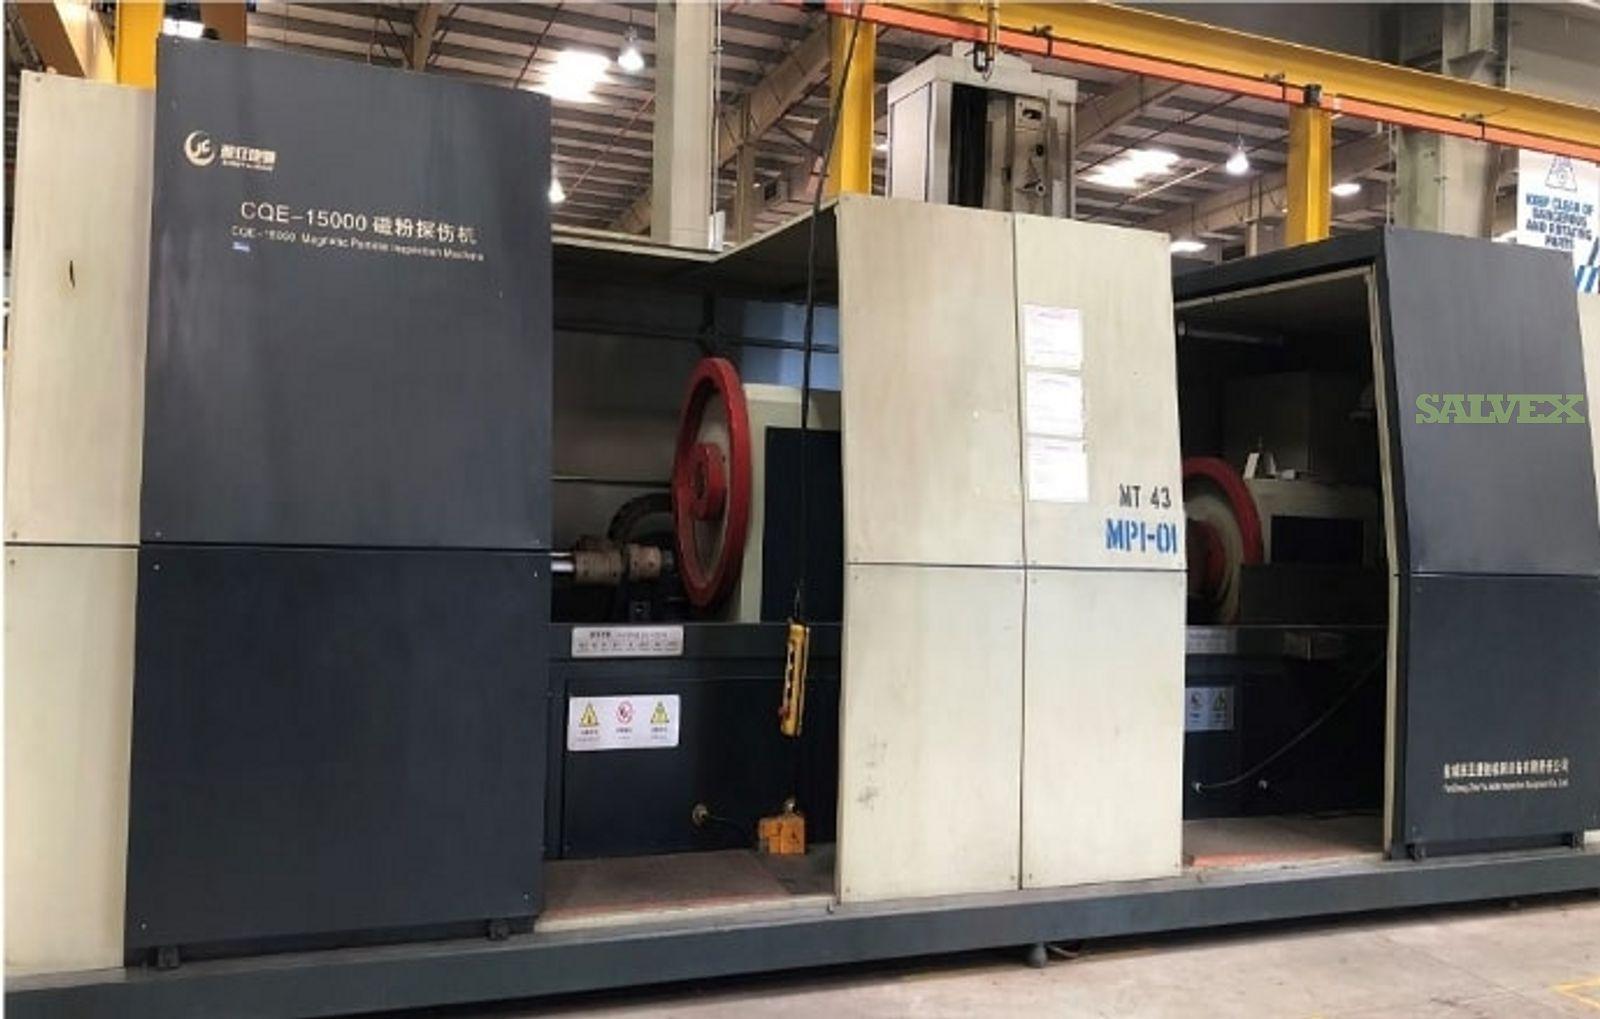 Zengya Jiechi CQE-15000 Magnetic Particle Inspection Machine 2016 (1 Unit)